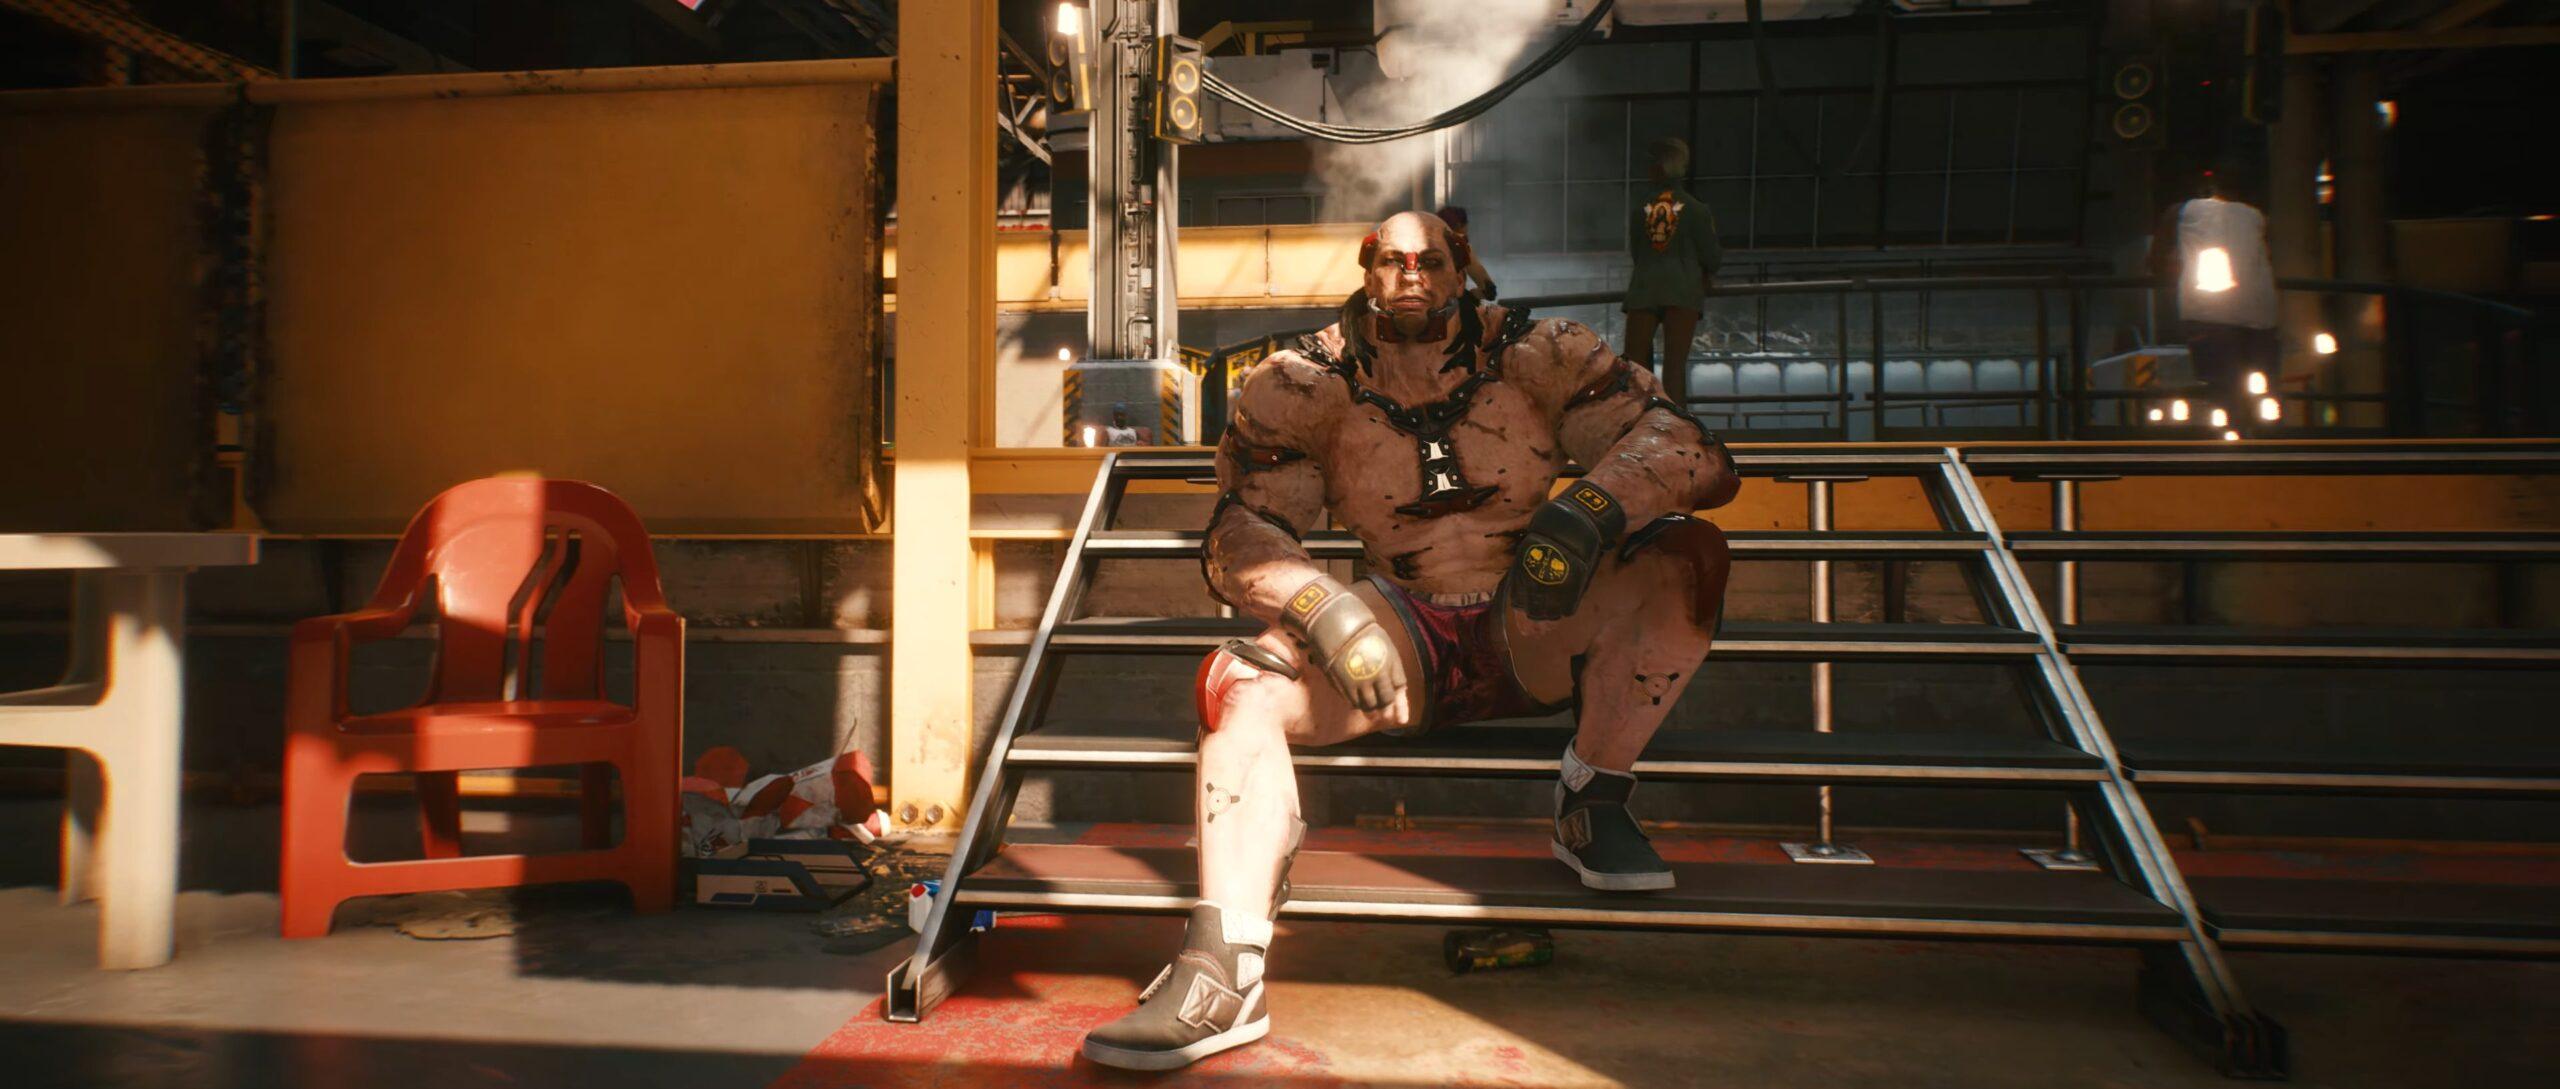 Cyberpunk 2077 — Gangs Of Night City 2 50 Screenshot